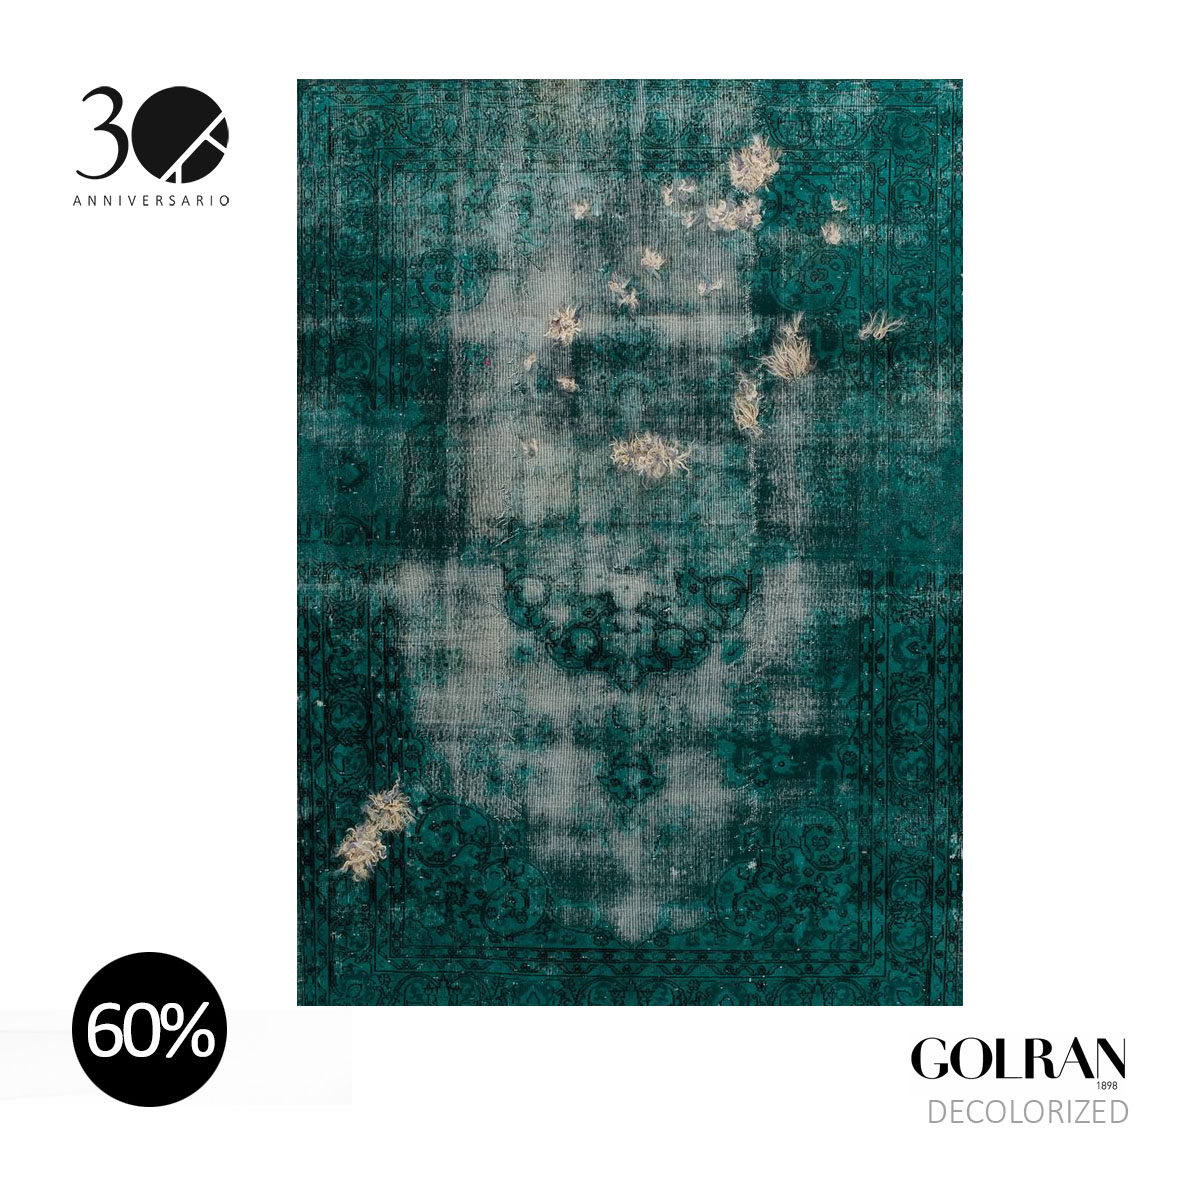 GOLRAN - DECOLORIZED 2